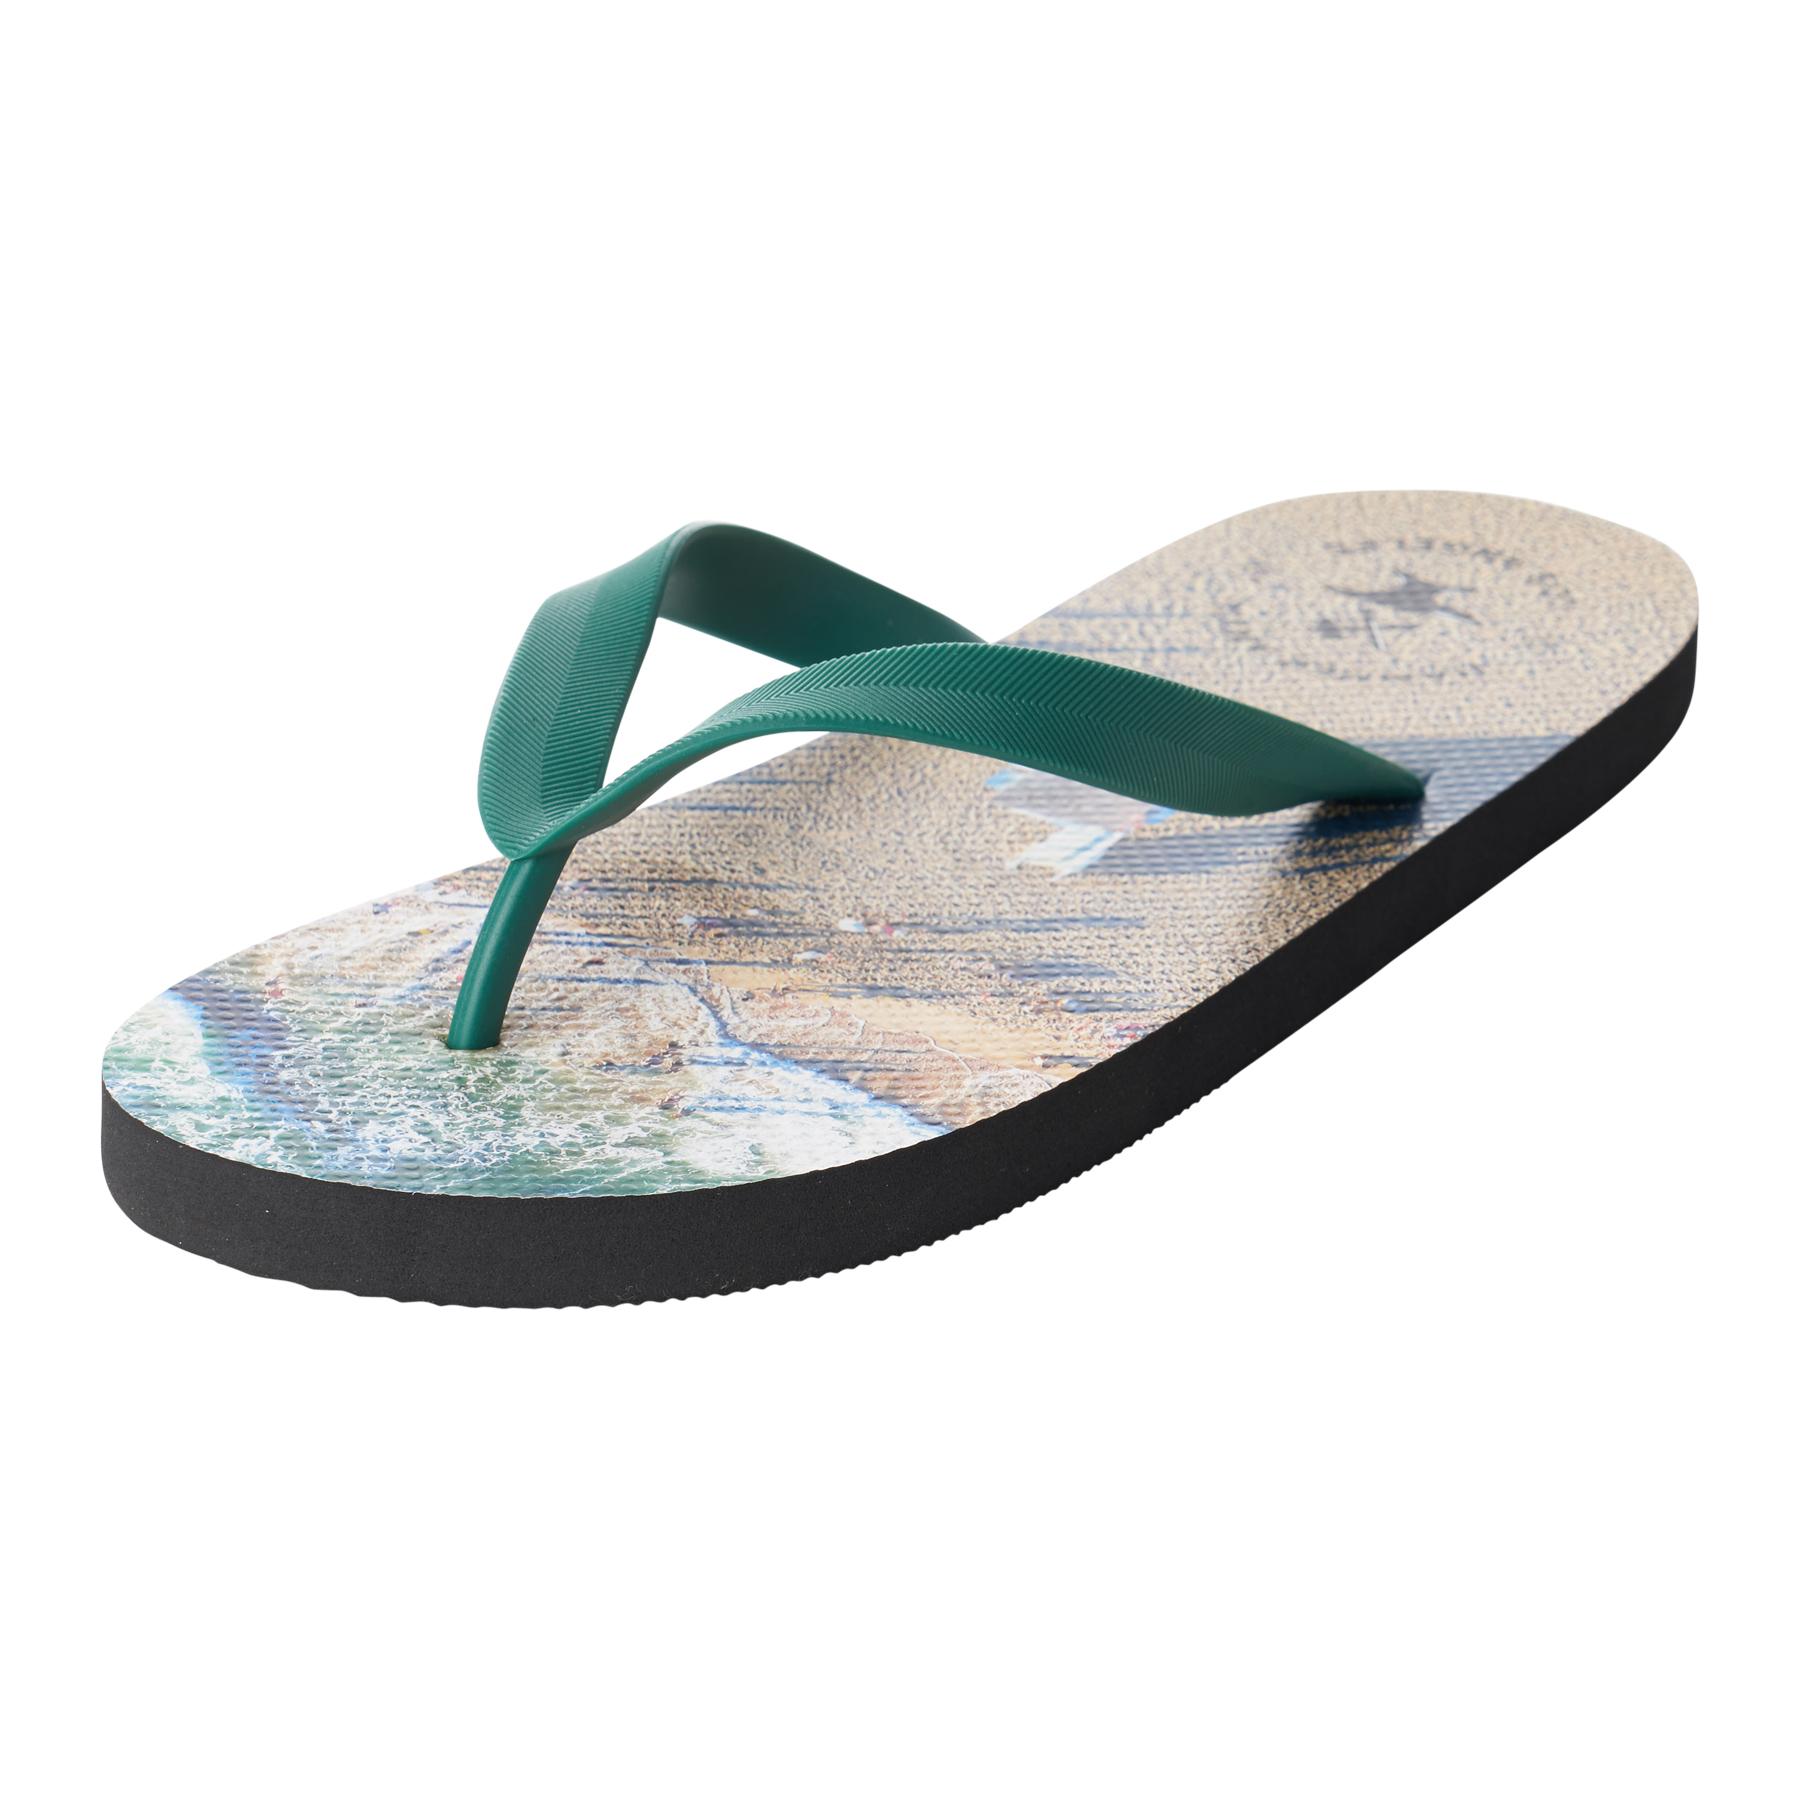 Hammer-Anvil-Mens-Flip-Flops-Casual-Thong-Summer-Sandals-Comfortable-Beach-Shoes thumbnail 12